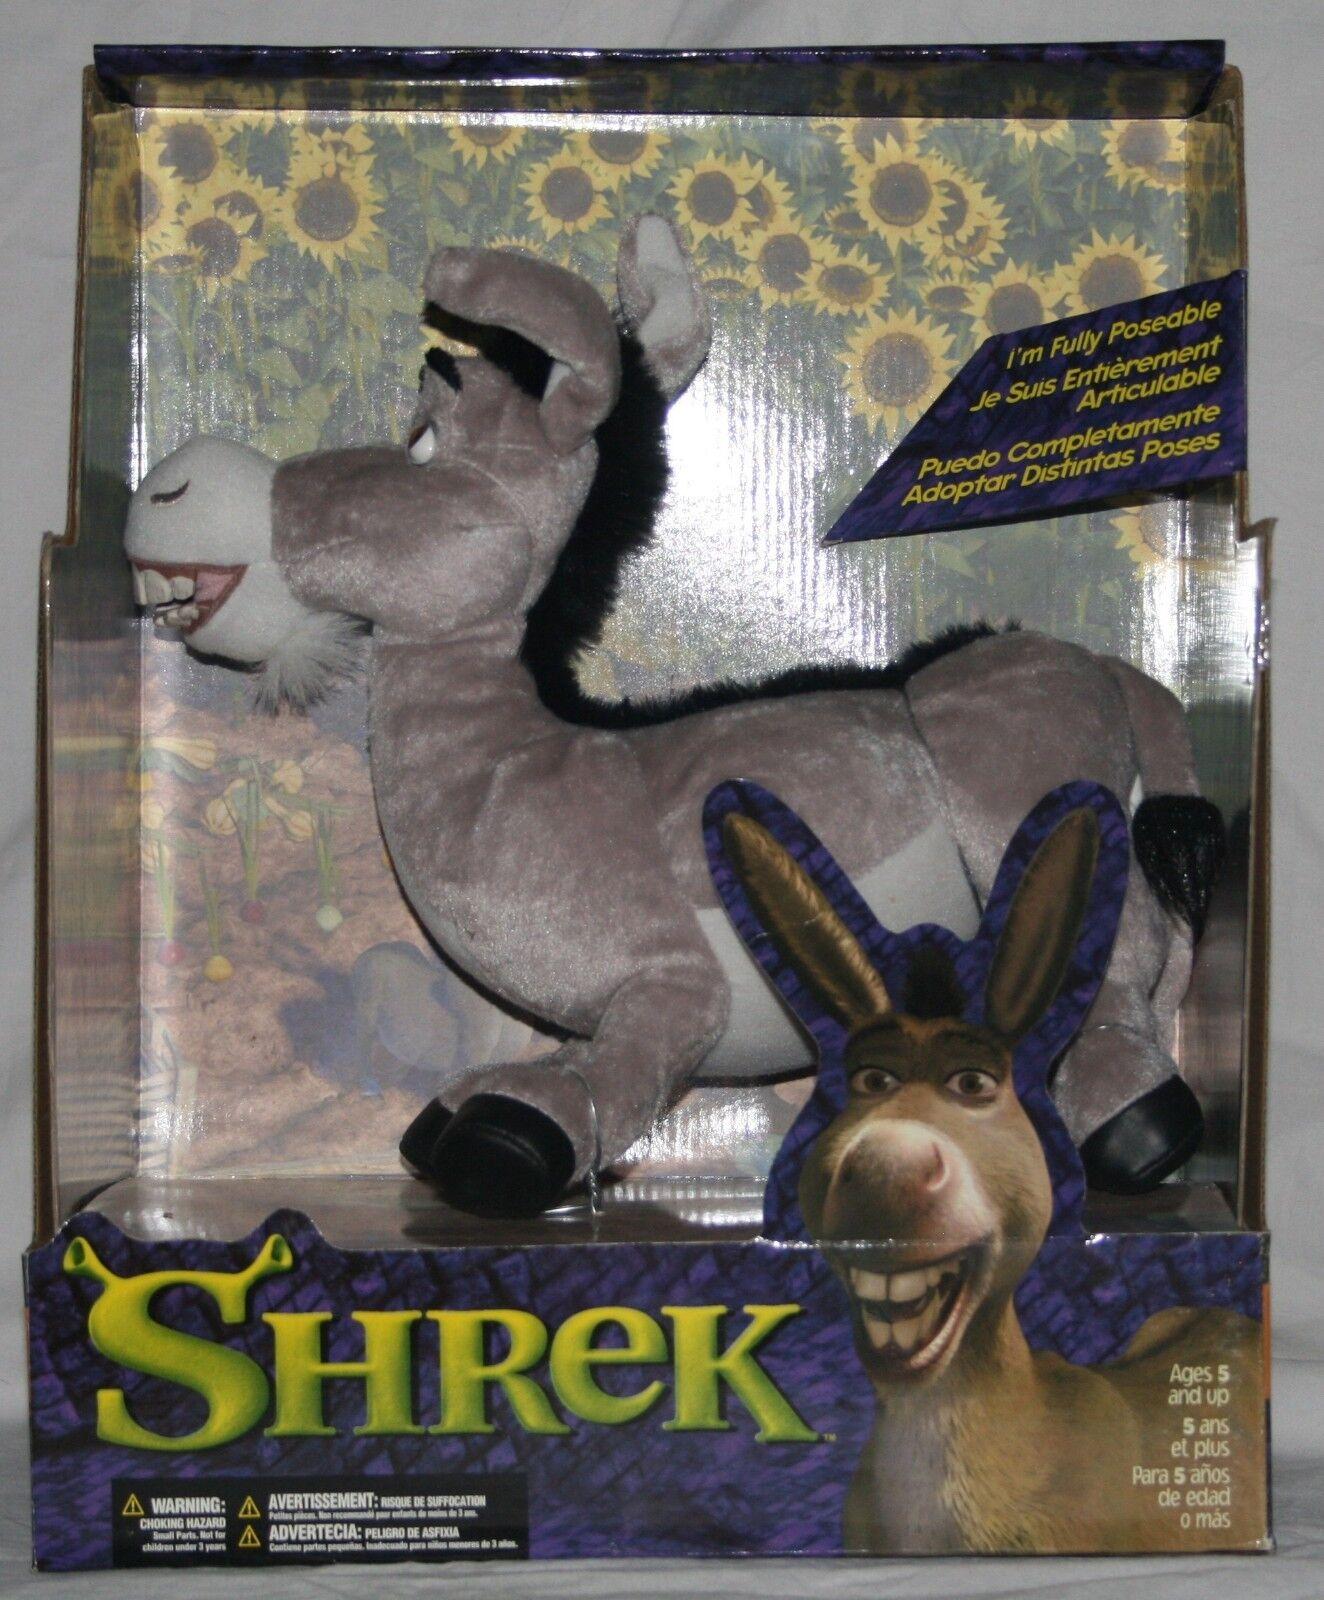 Shrek Donkey poseable plush doll